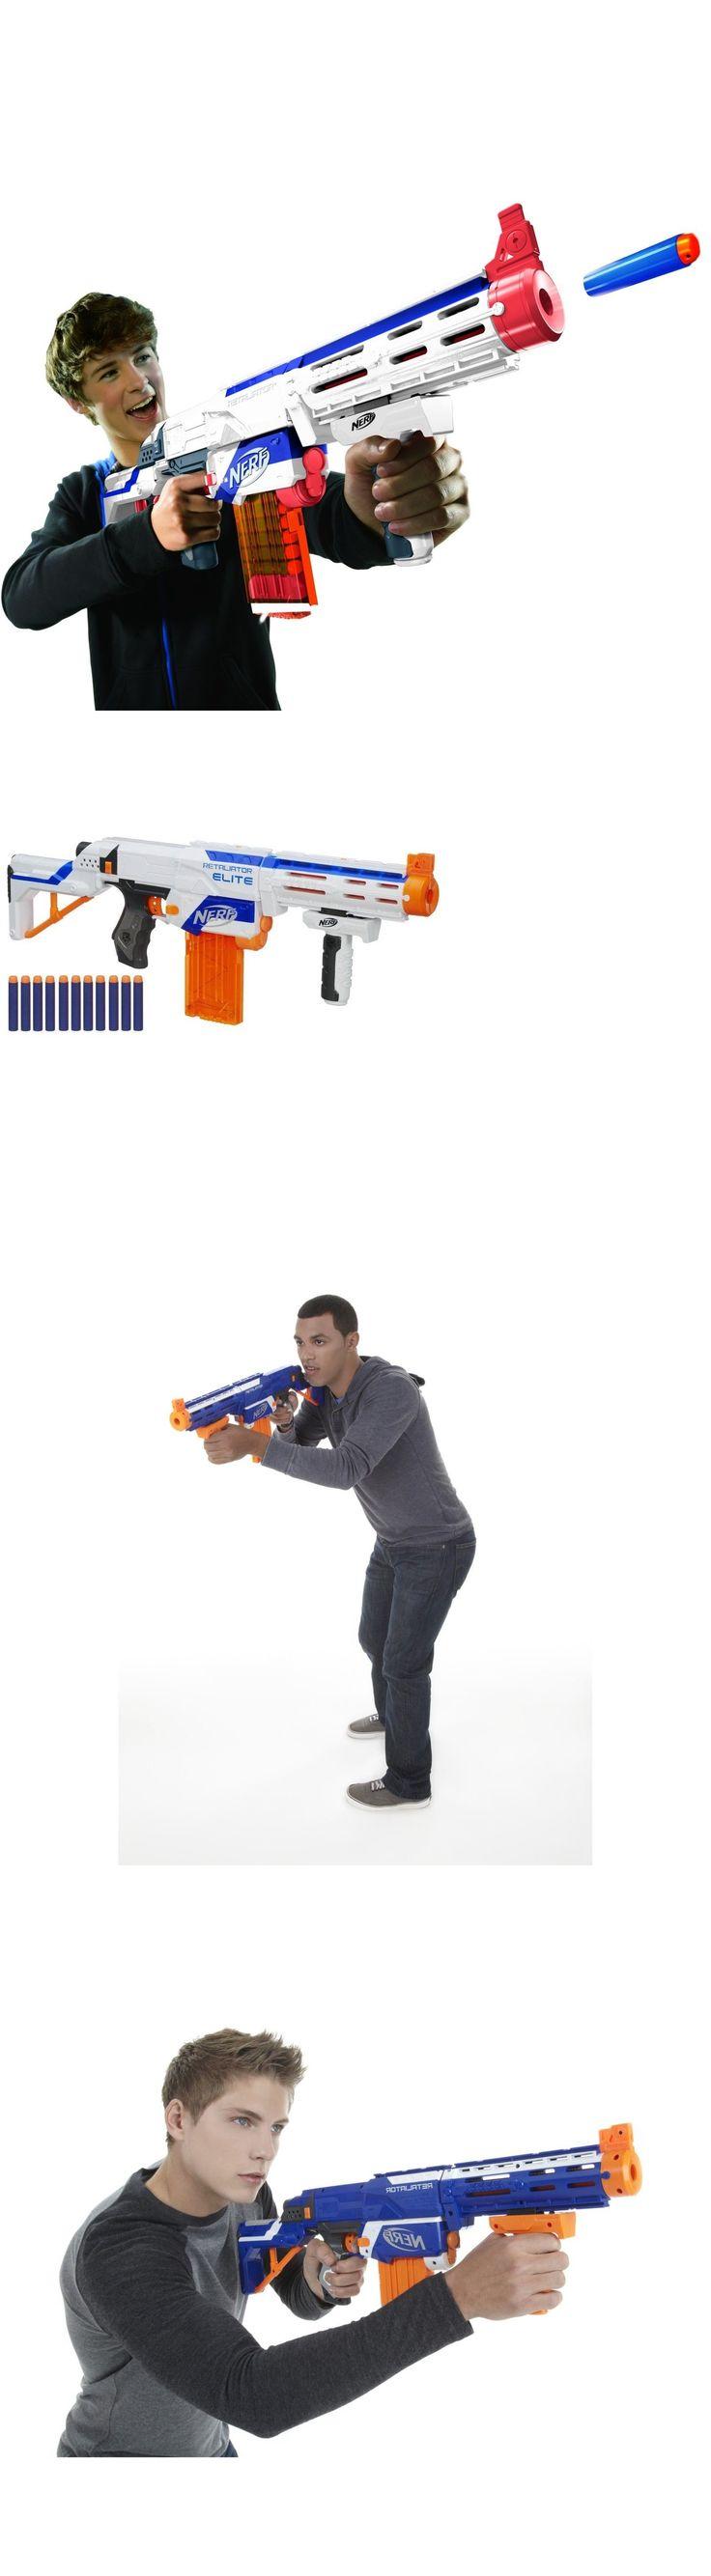 Dart Guns and Soft Darts 158749: N-Strike Elite Retaliator Dart Blaster Gun Toy Fires Darts Up To 90 Feet New -> BUY IT NOW ONLY: $35.64 on eBay!